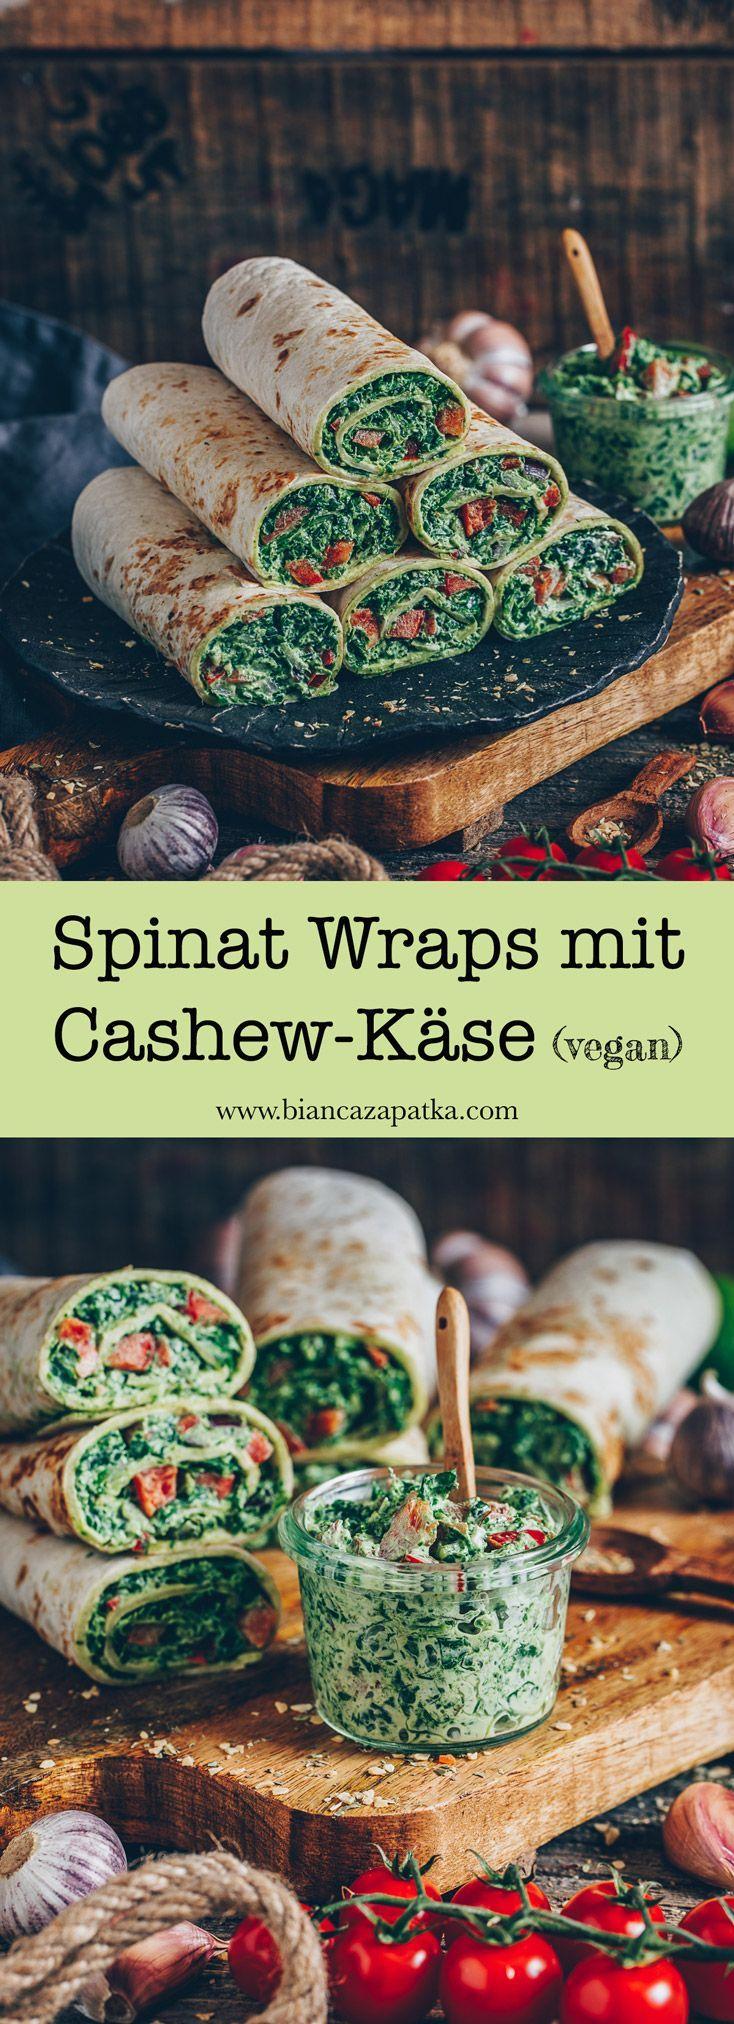 Spinat Wraps mit Cashew-Käse (vegan) – Bianca Zapatka | Rezepte